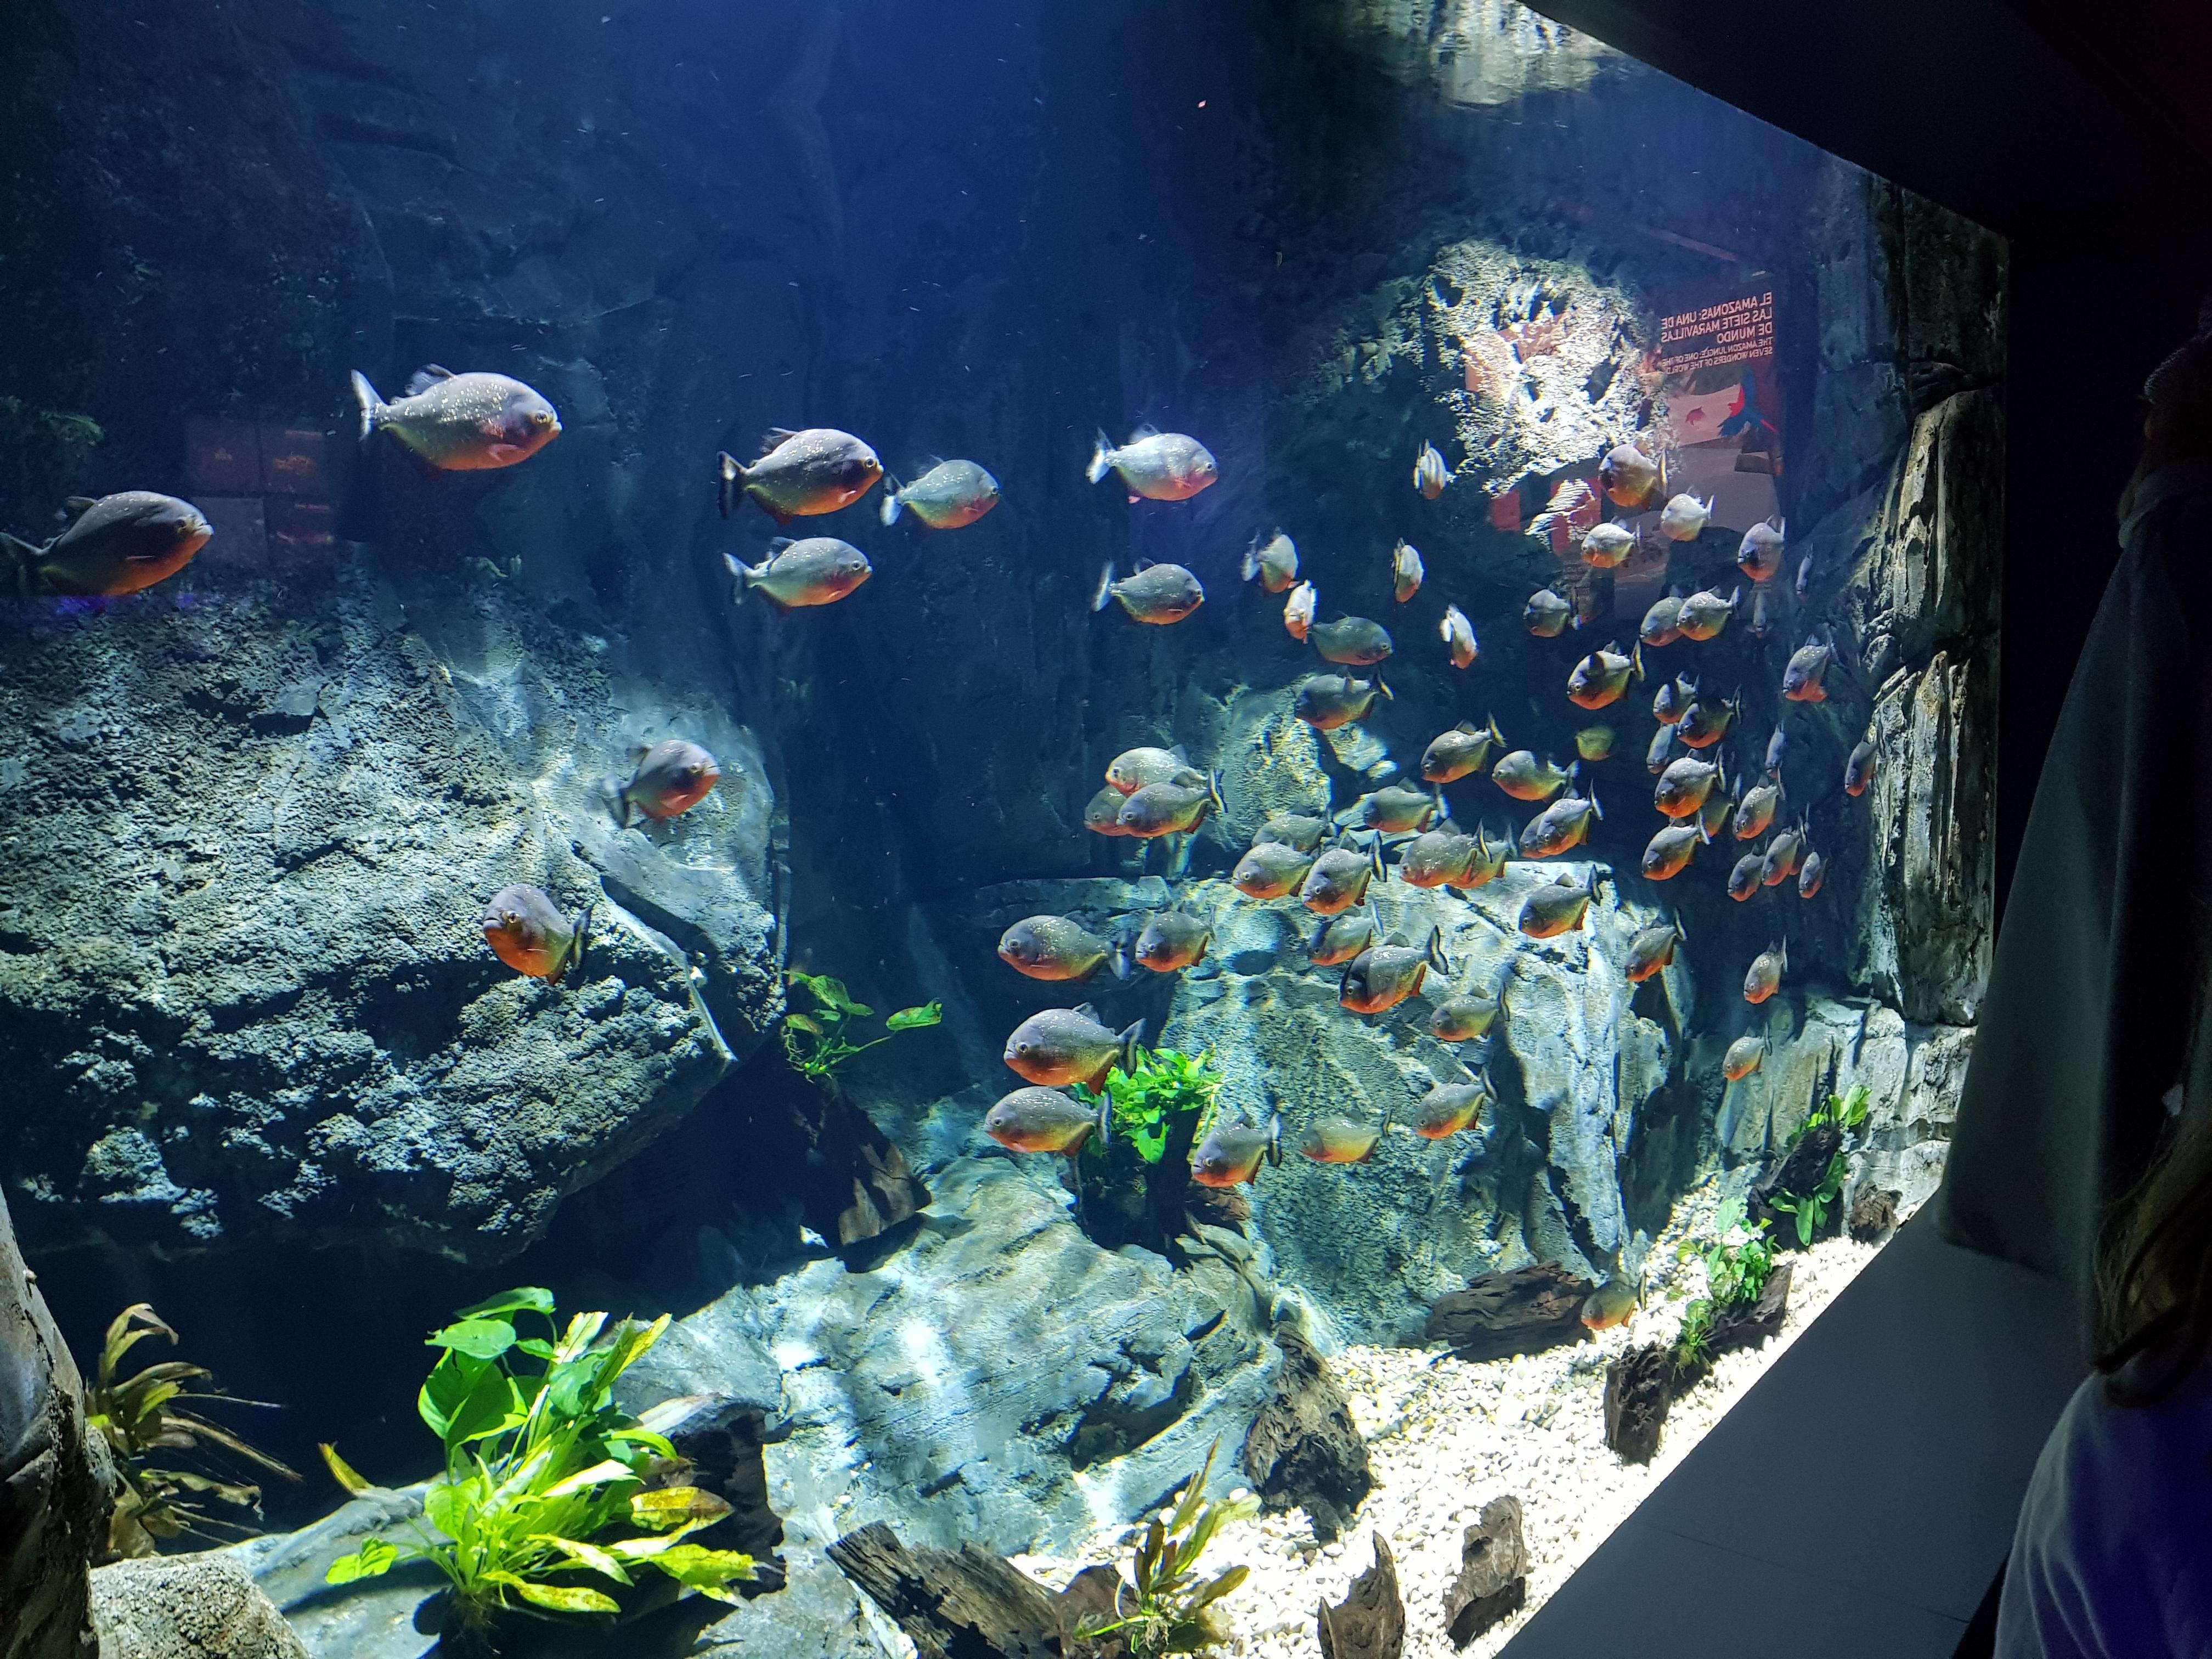 Fotos Aquarium Xanadú 3ºB 19